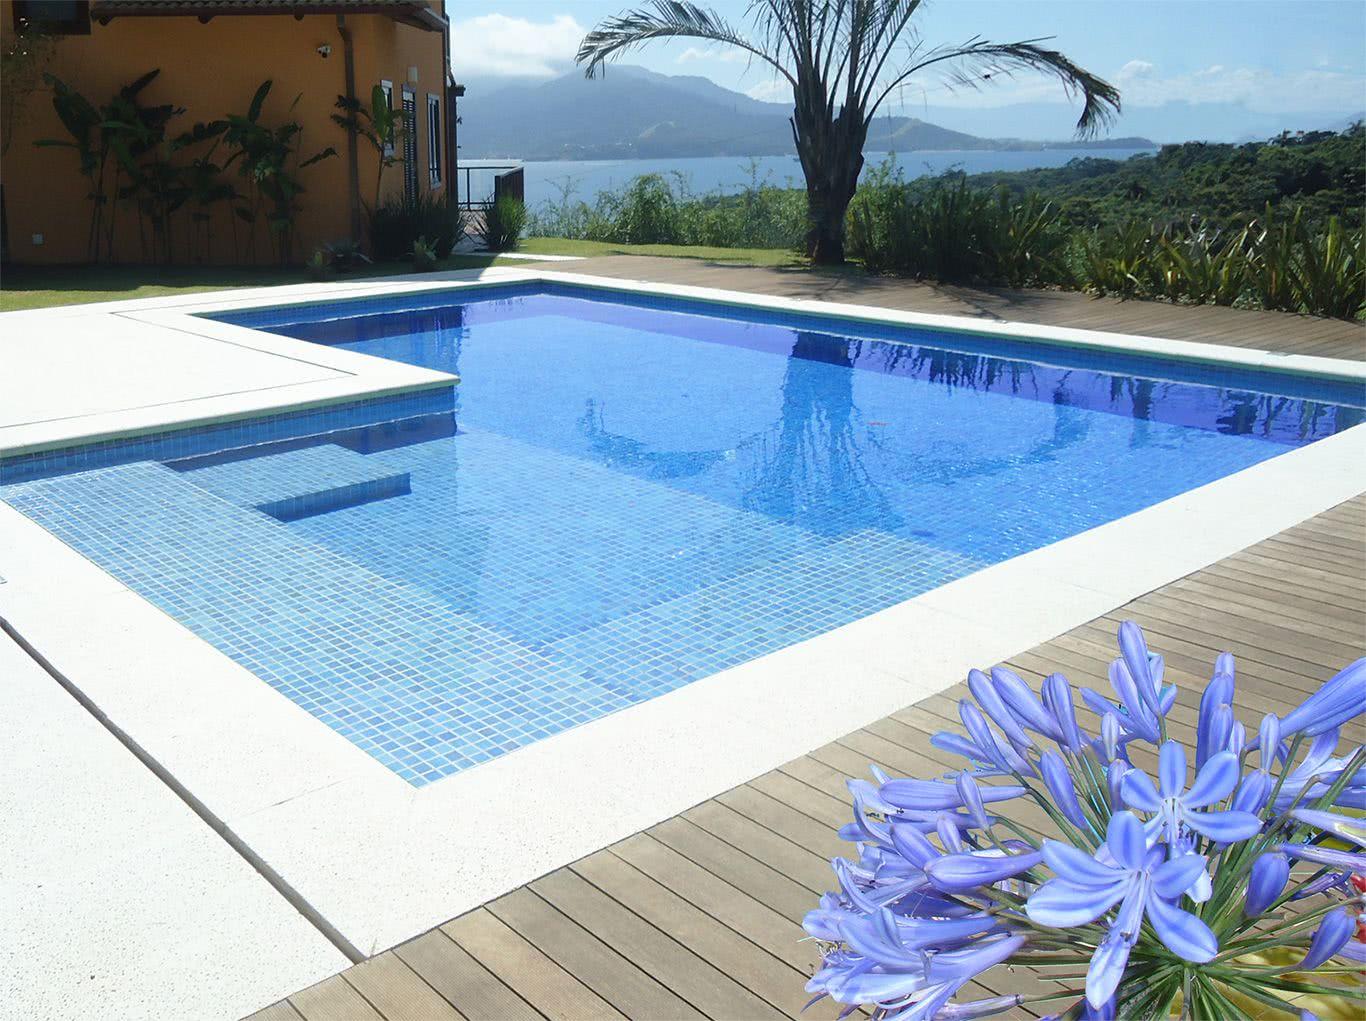 Piscina de vinil o que vantagens e fotos para se inspirar - Material de piscina ...